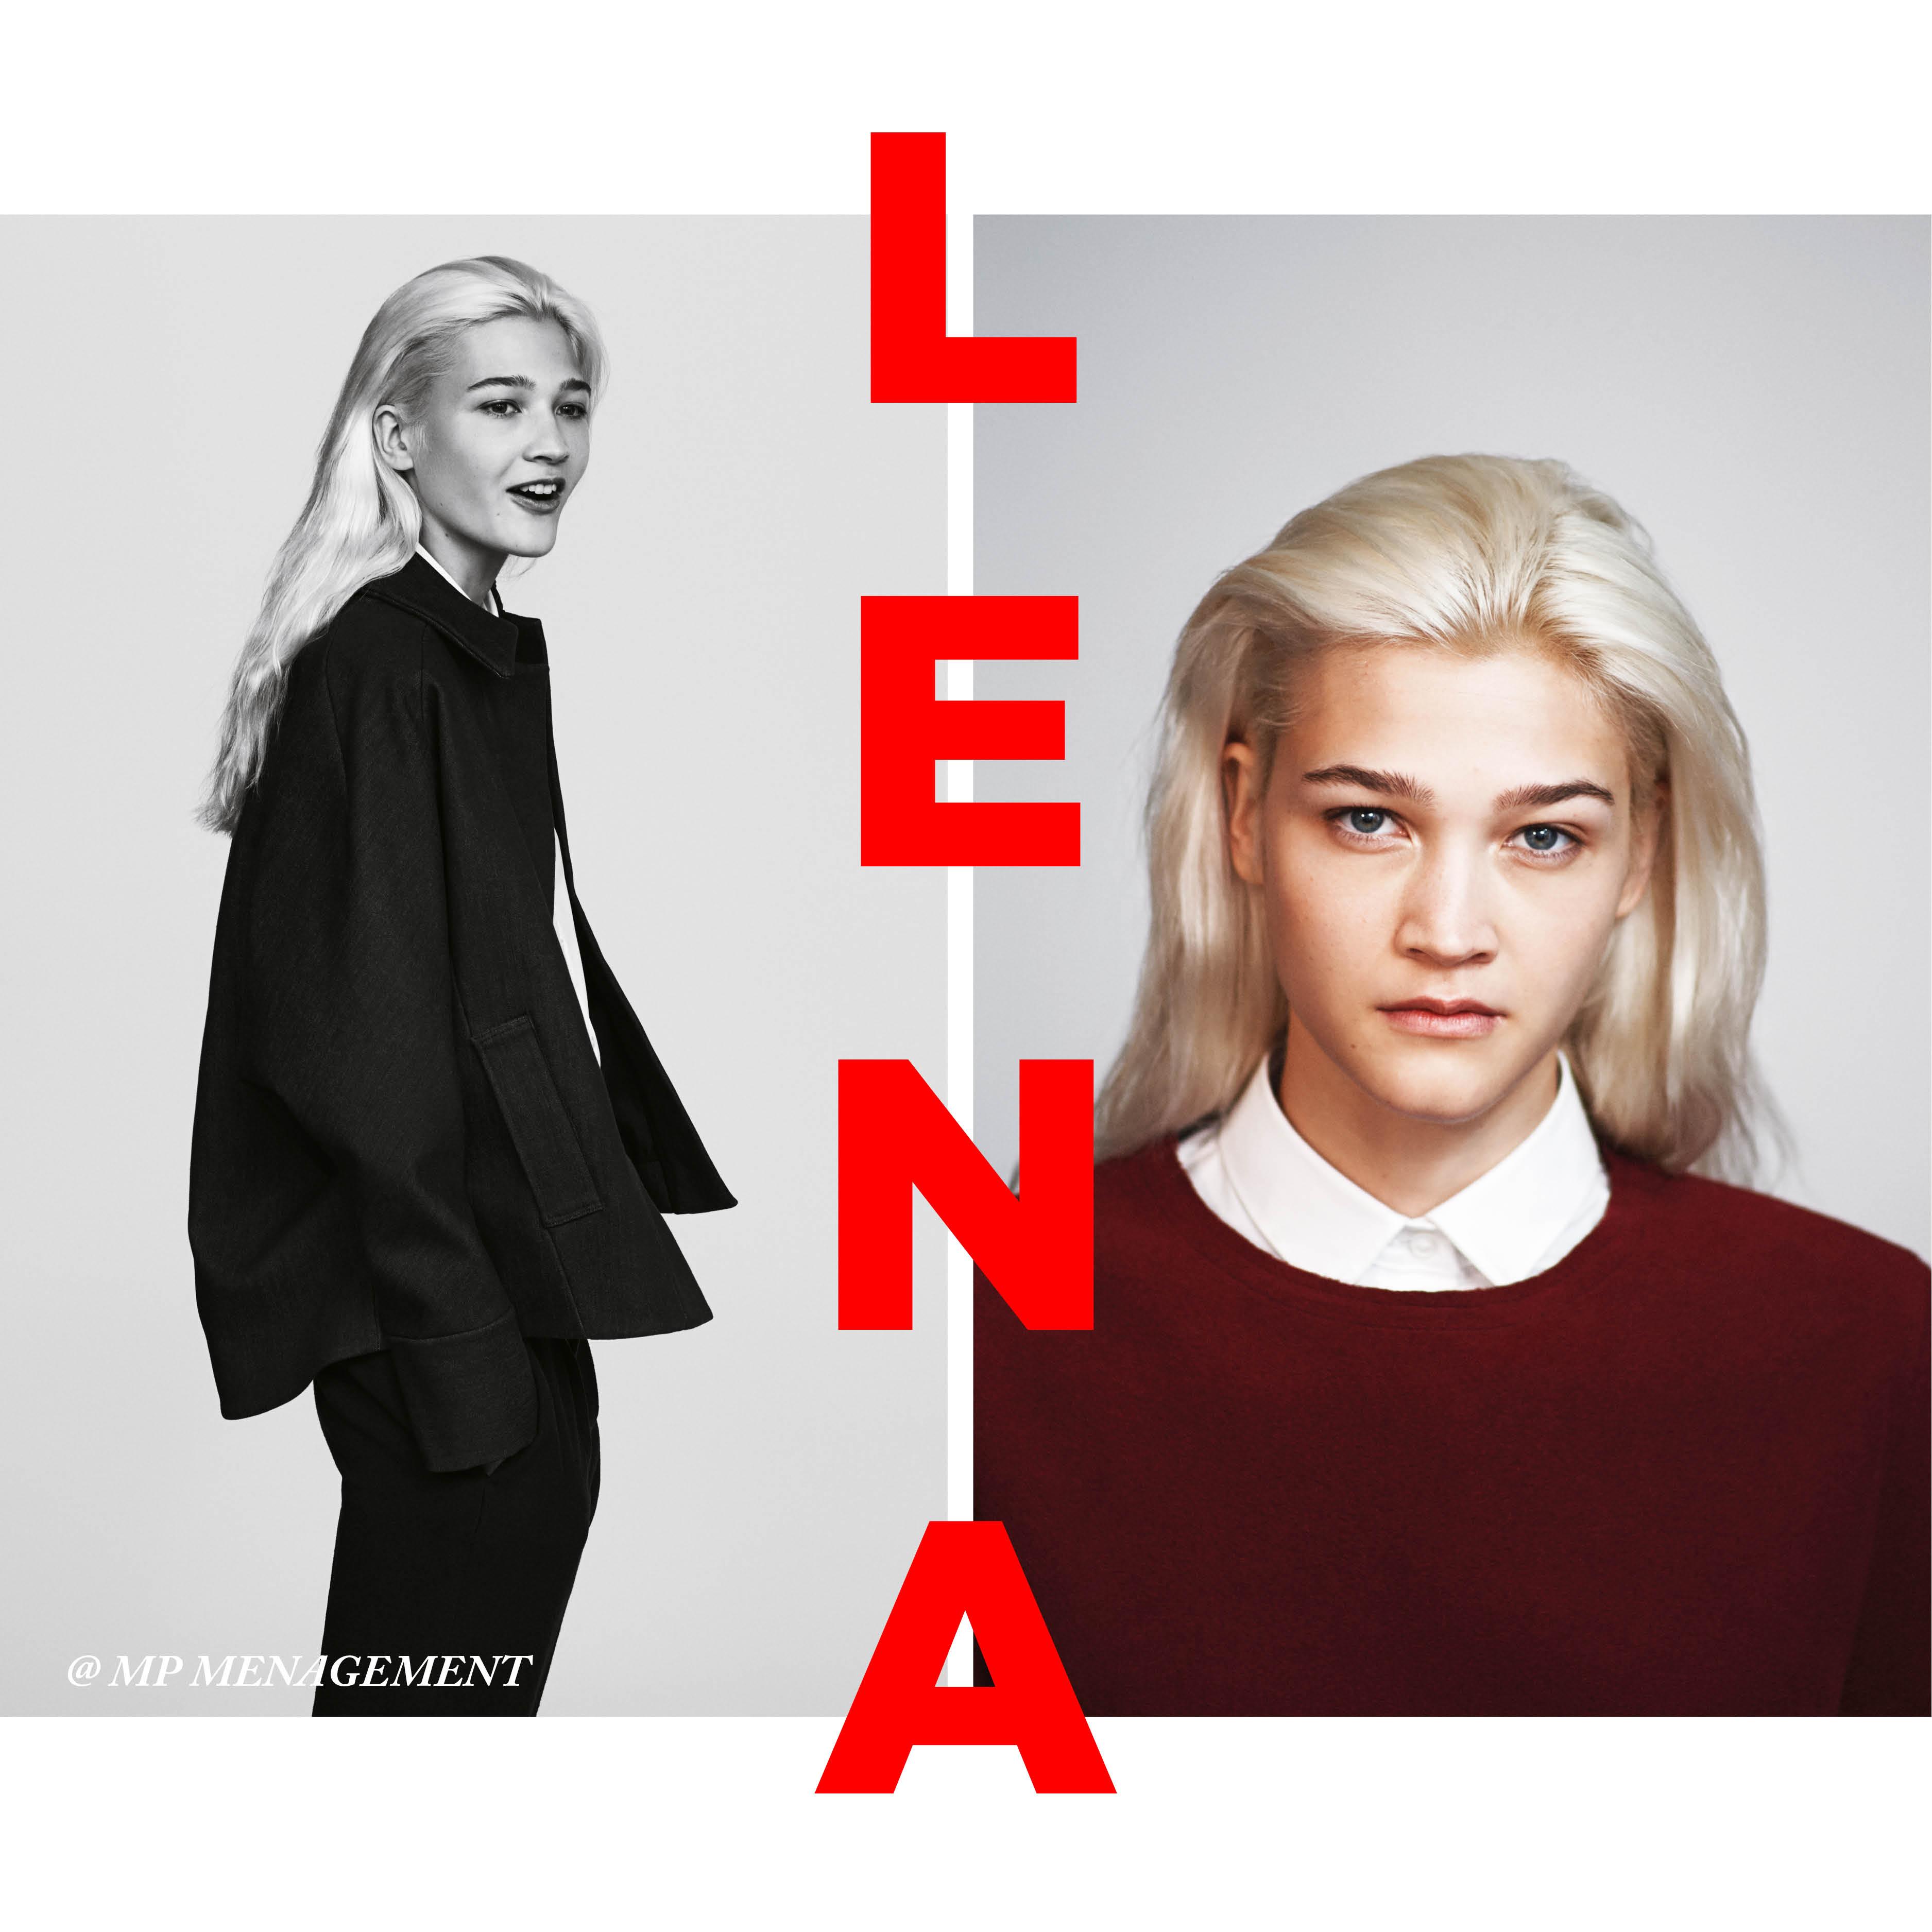 "Punkt October 2014 ""Casting call"" | MaxMartin | Punkt | Ilaria Chionna | Numerique Retouch Photo Retouching Studio"